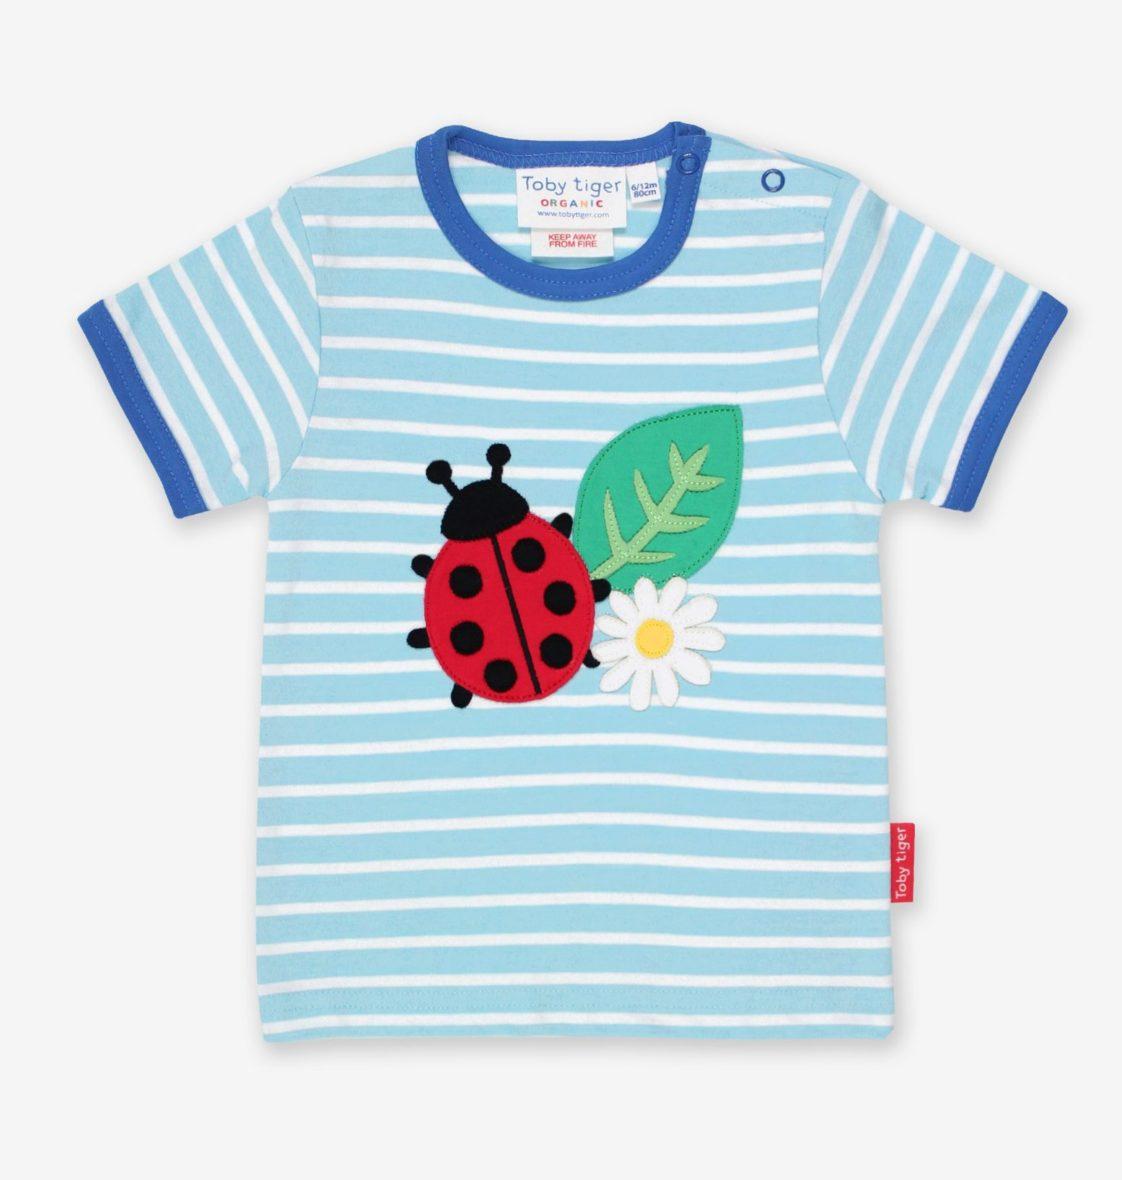 Toby Tiger t-shirt Ladybird Applique